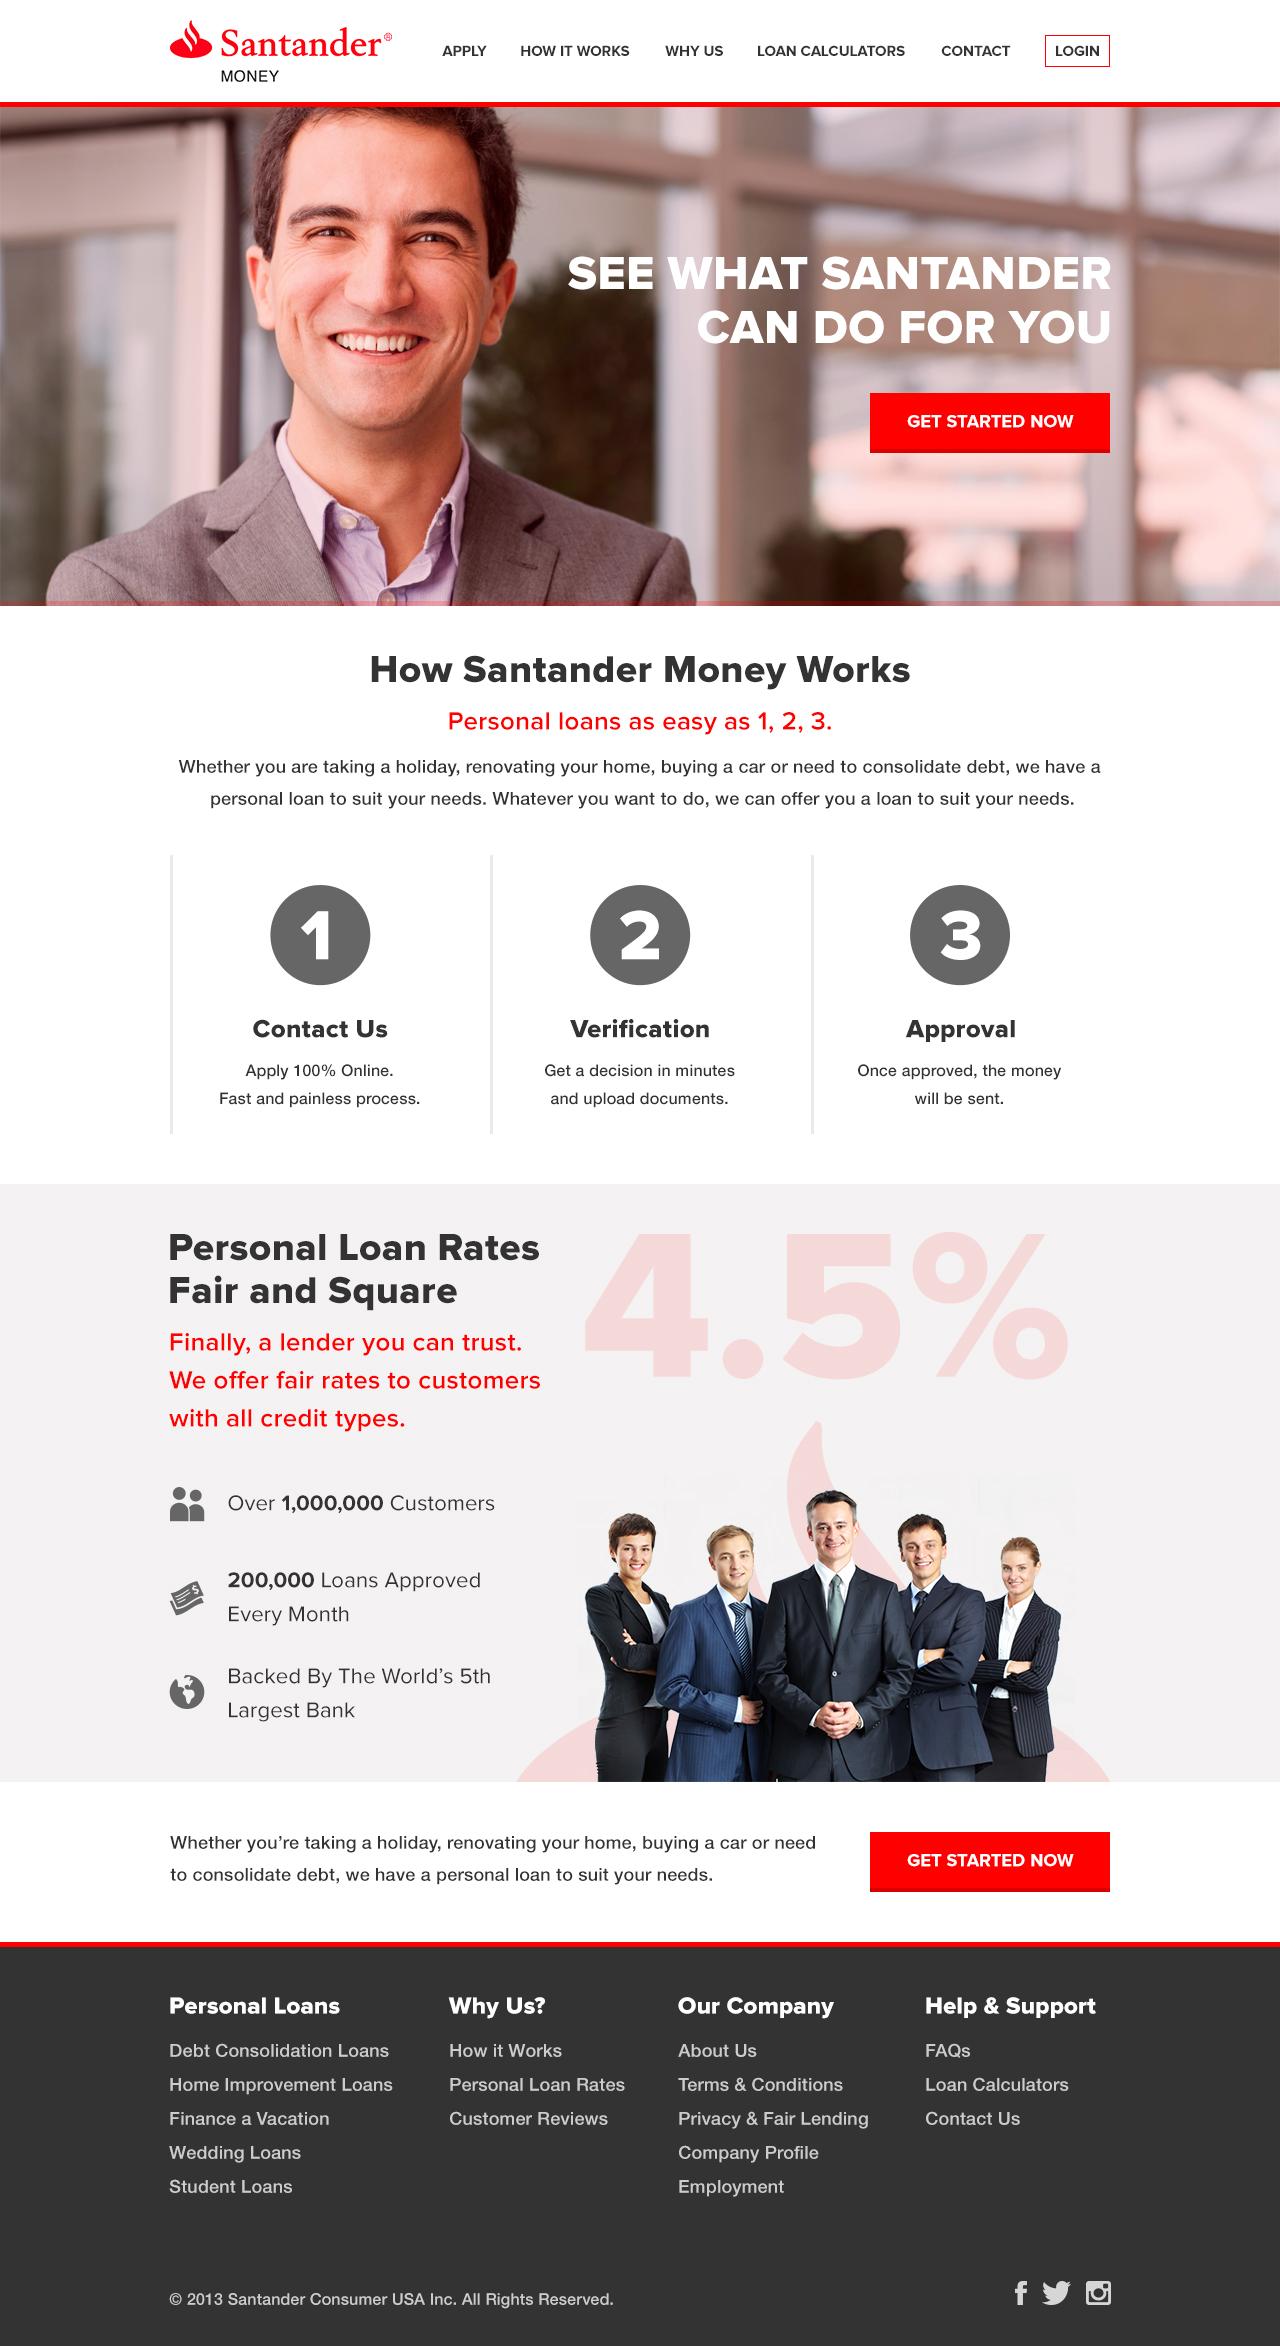 Santander-money-hp